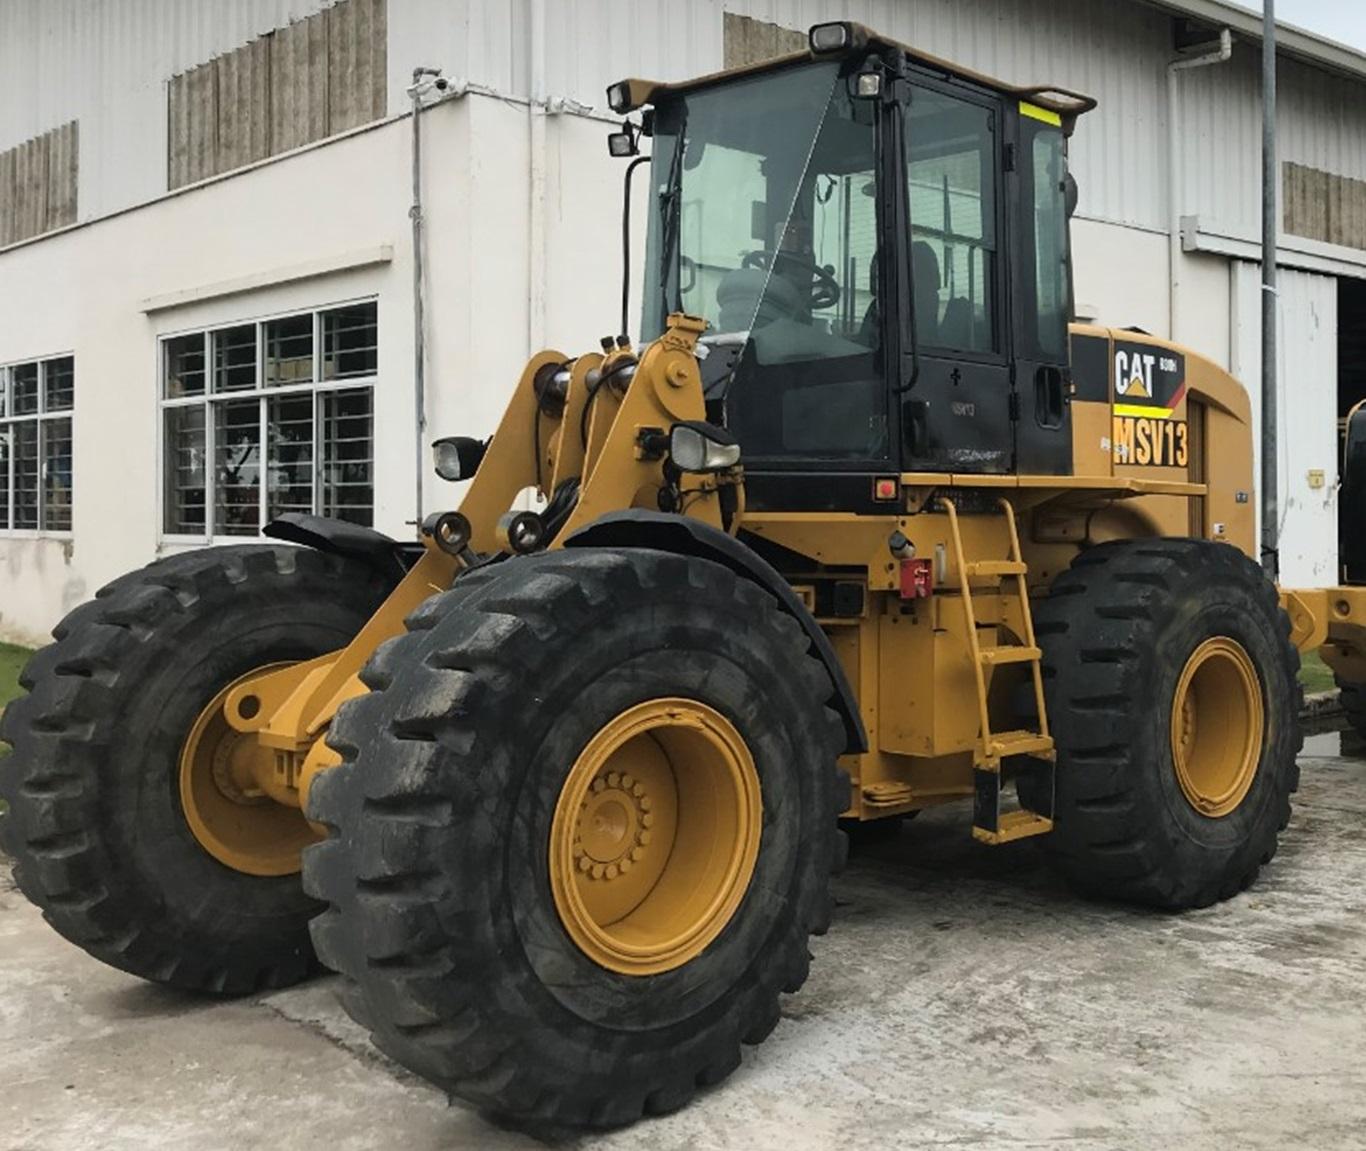 Cat 930H - Phú Thái Cat